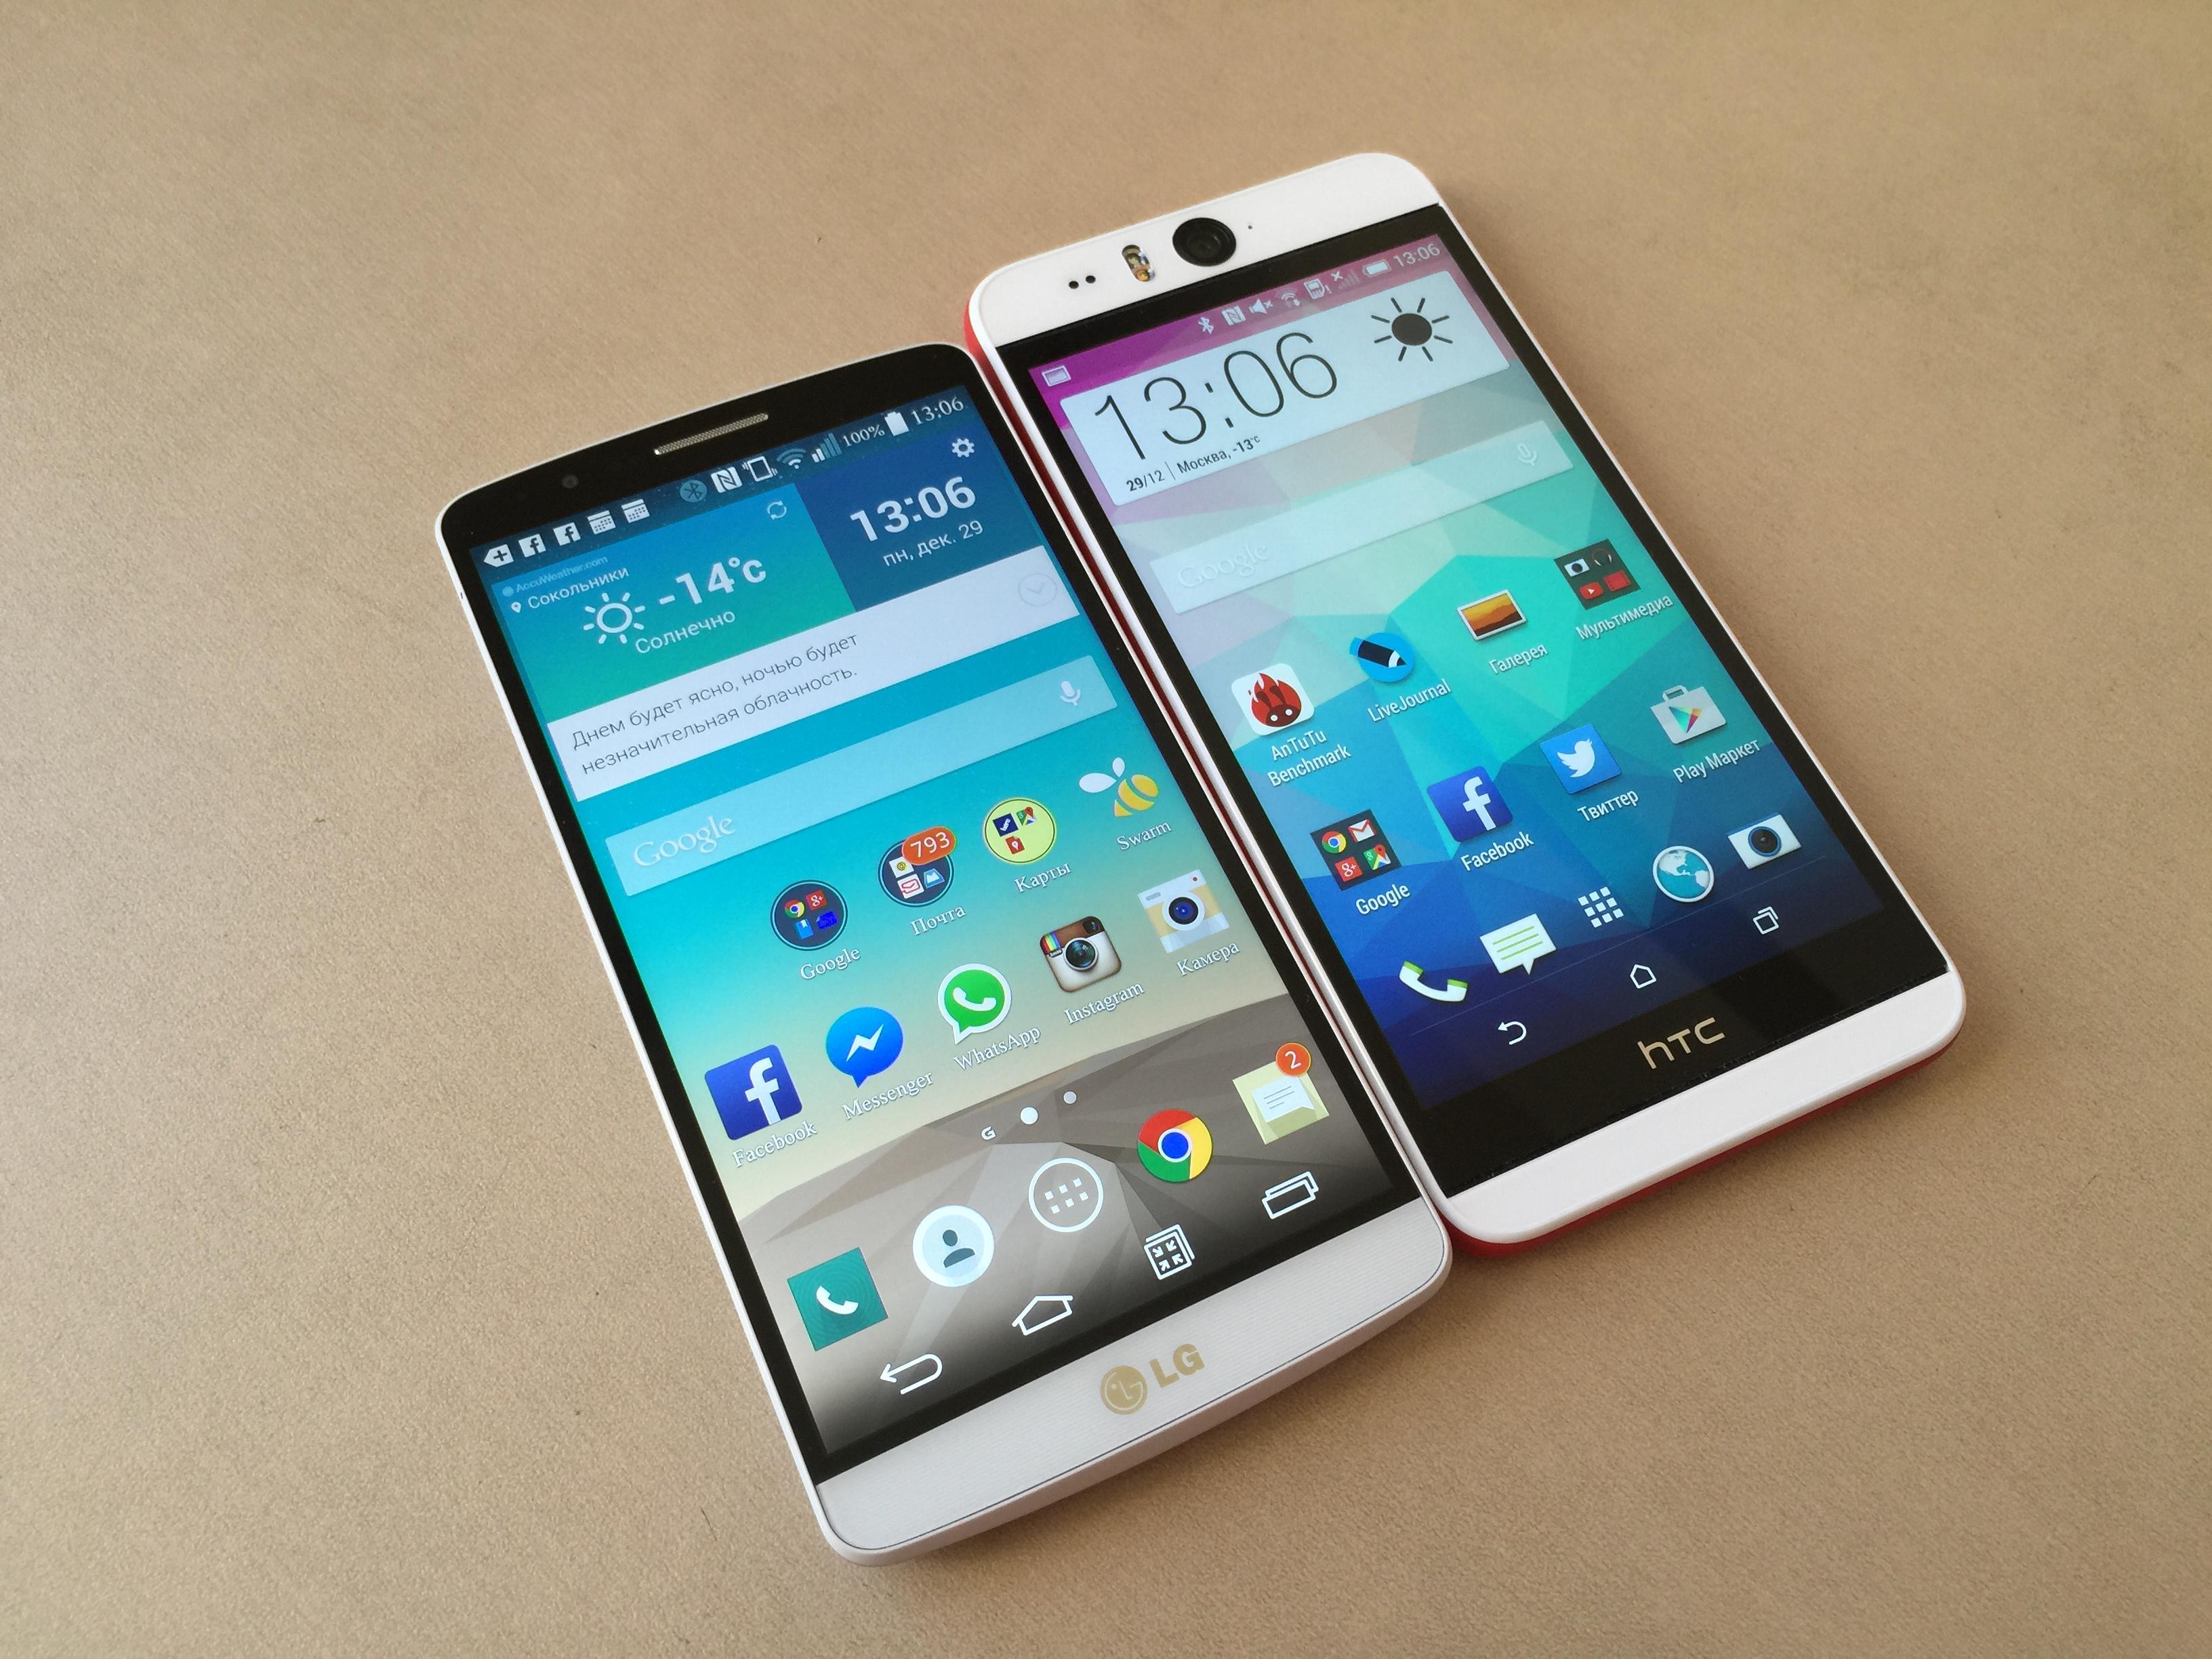 HTC Desire Eye � LG G3. �������� �� ��, ��� � LG G3 ��������� ������ ������, ��� � Desire Eye, ��� G3 ������ Desire Ey�